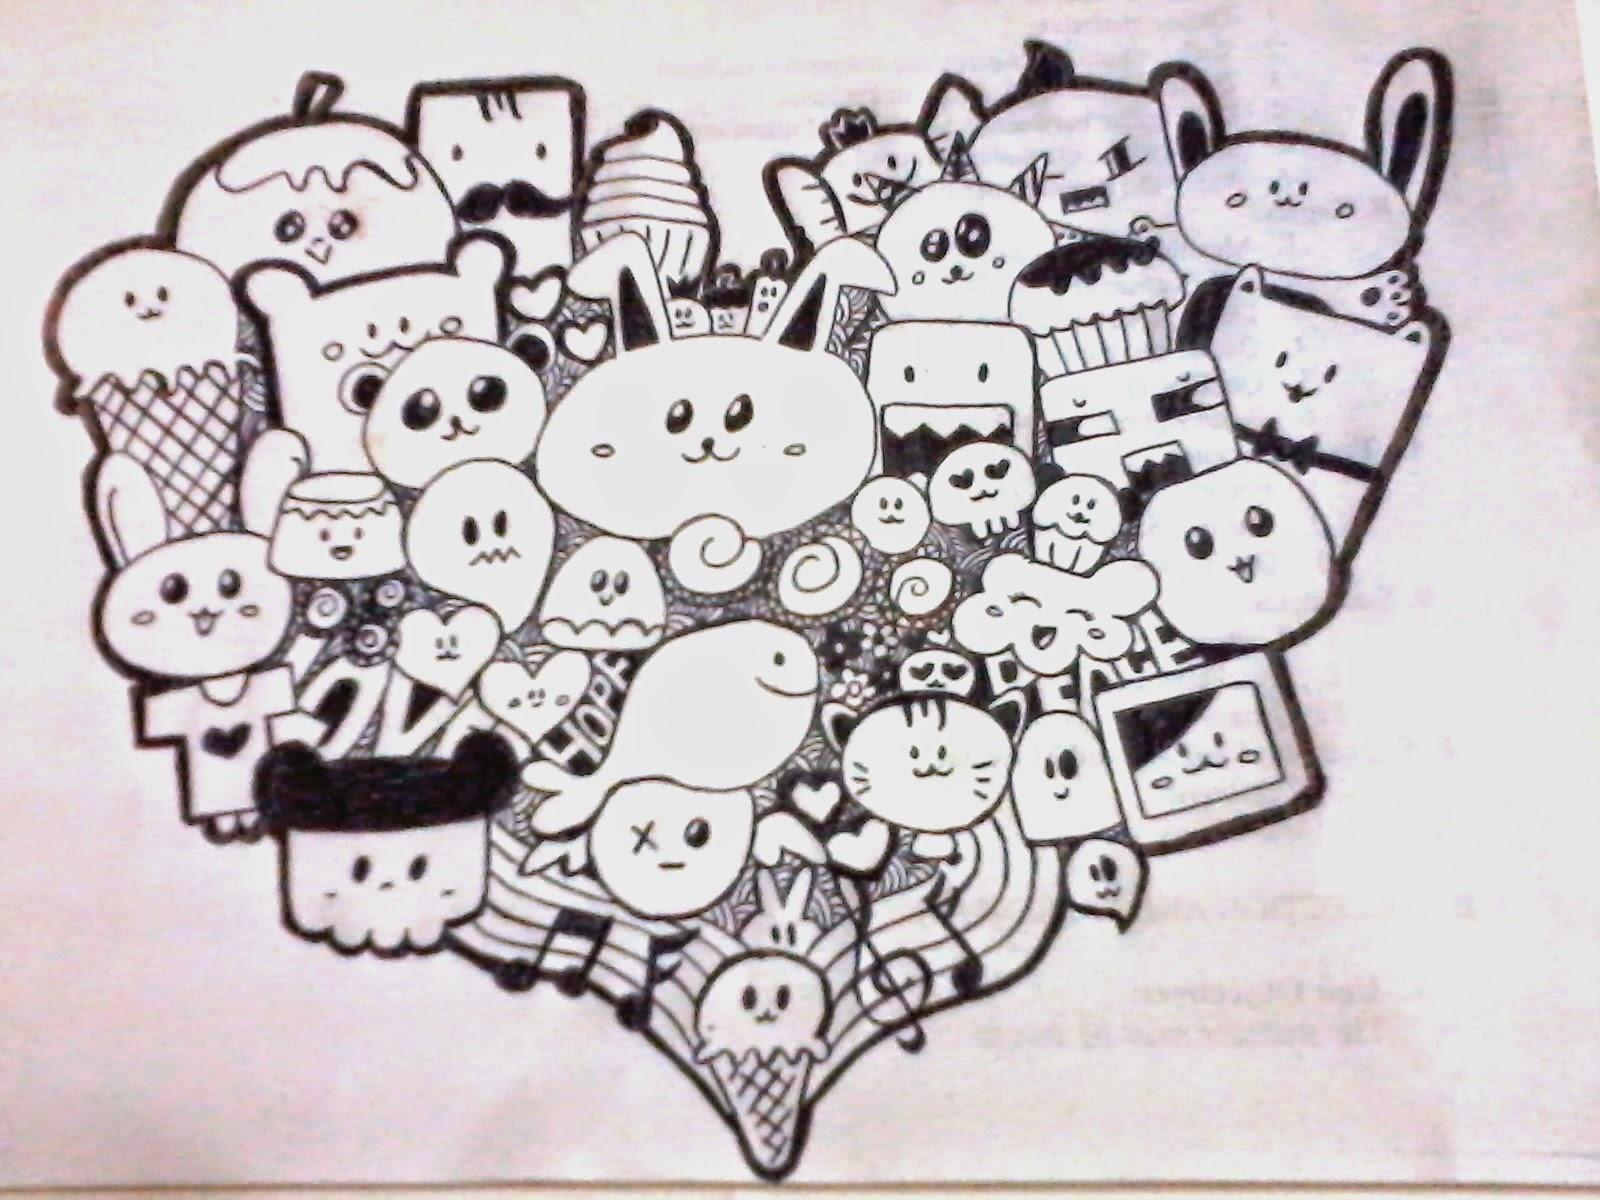 Download Gambar Sketsa Animasi Doodle